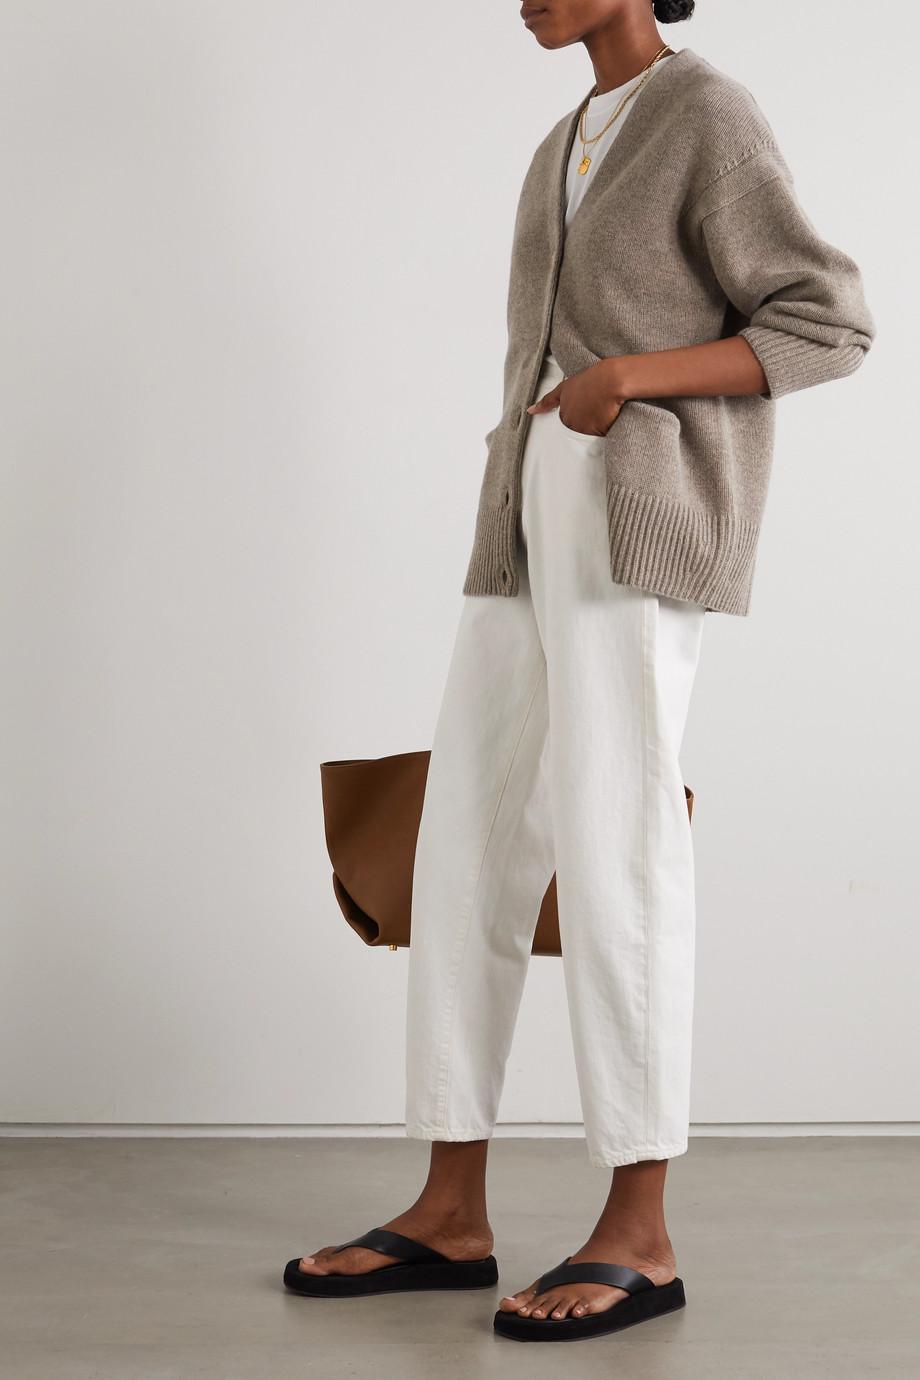 LOULOU STUDIO Sri mélange wool and cashmere-blend cardigan